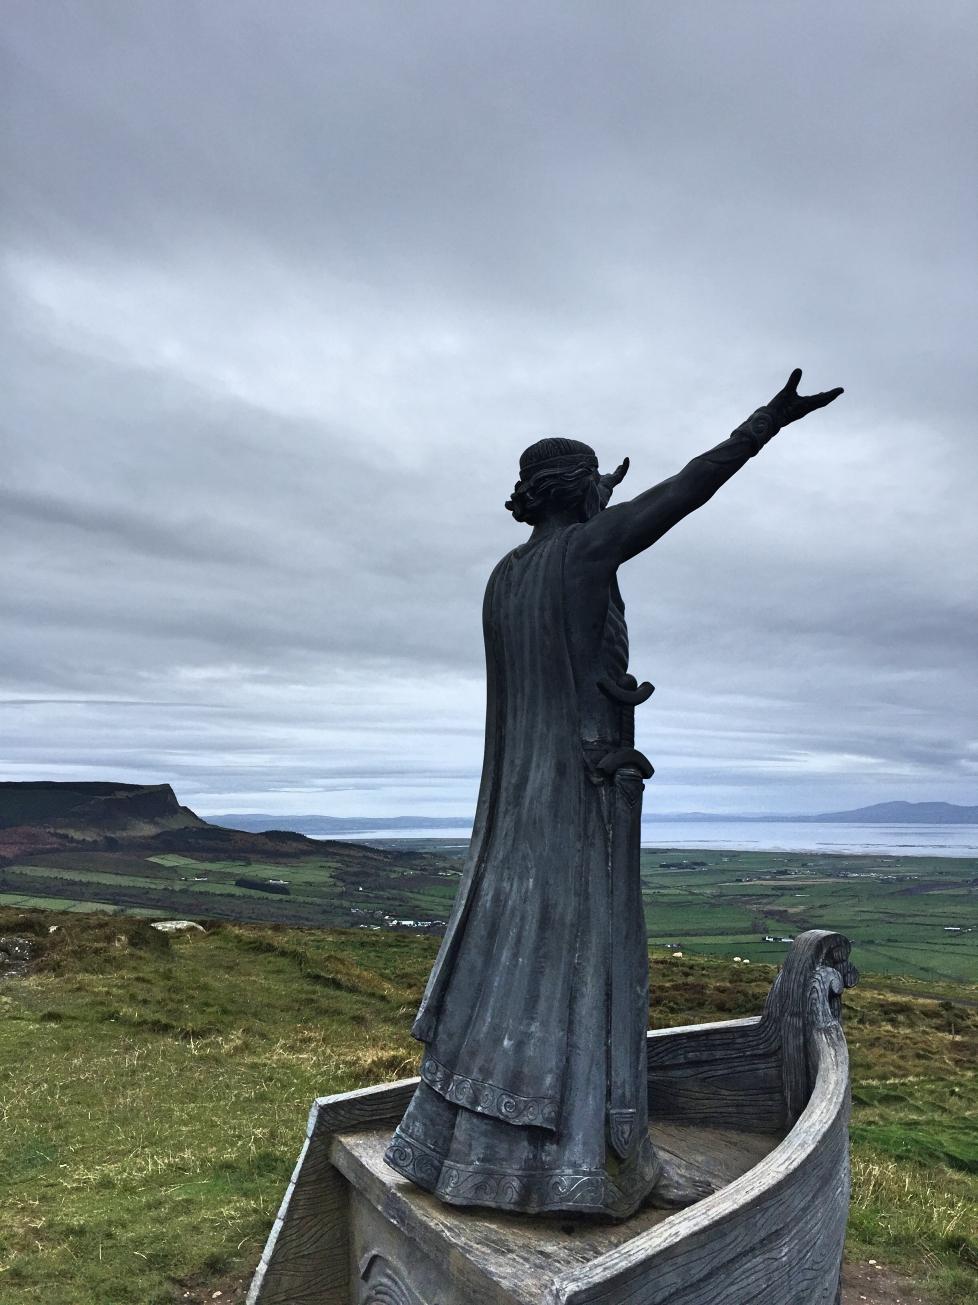 limavady_binevenagh_gortmore_view__niexplorer_ni_explorer_northern_ireland (6).jpg